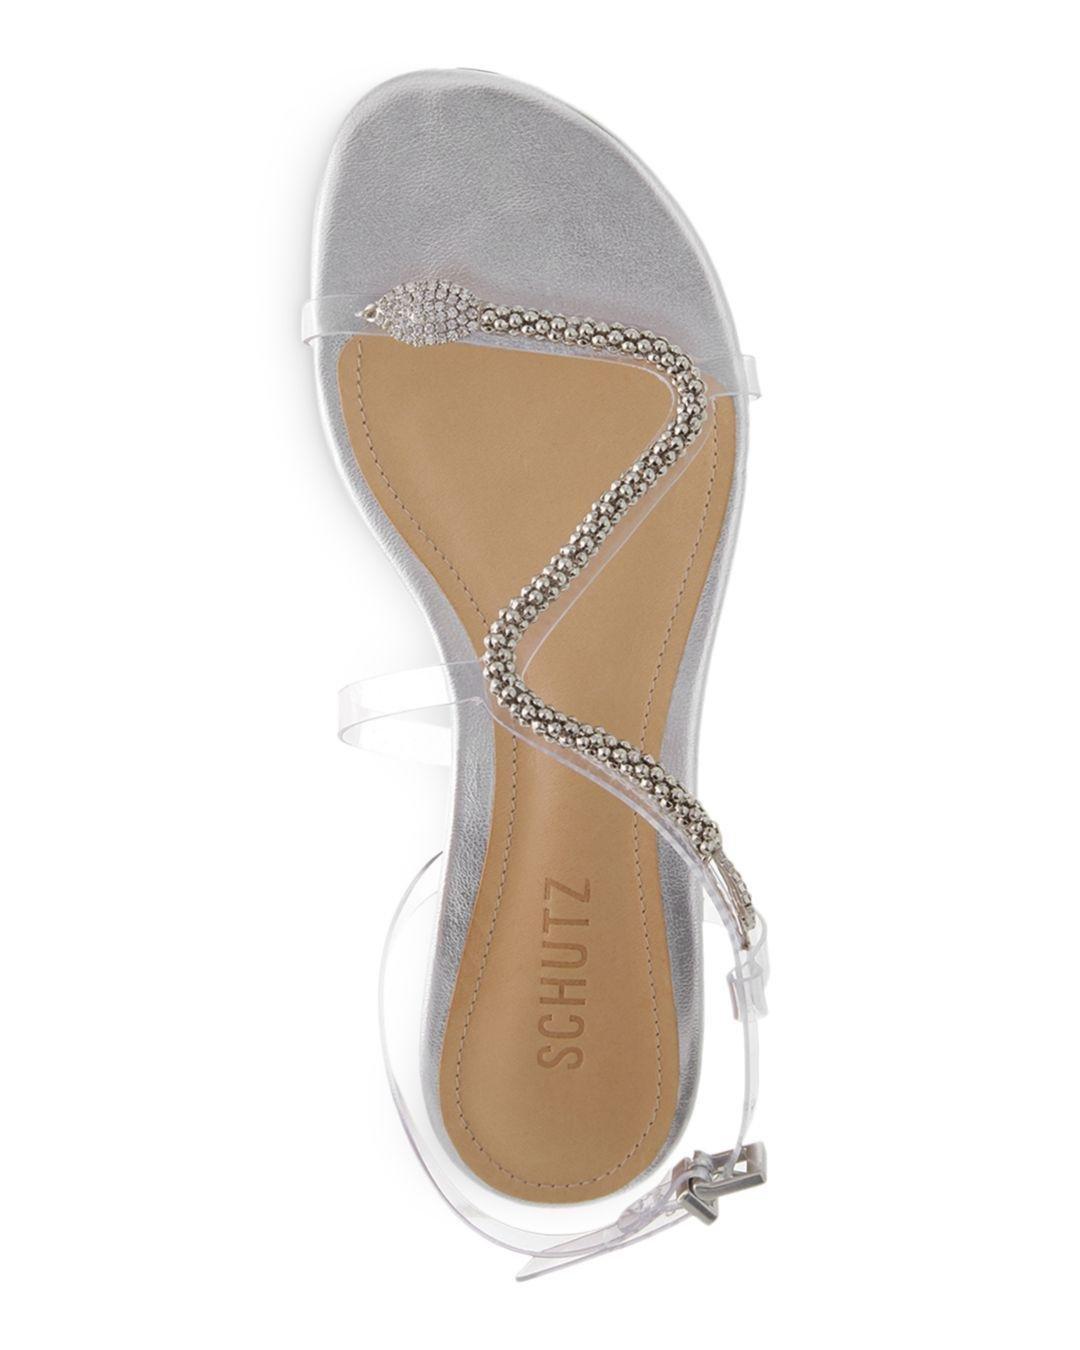 ad5776b99 Schutz - White Gabbyl Embellished Sandals - Lyst. View fullscreen